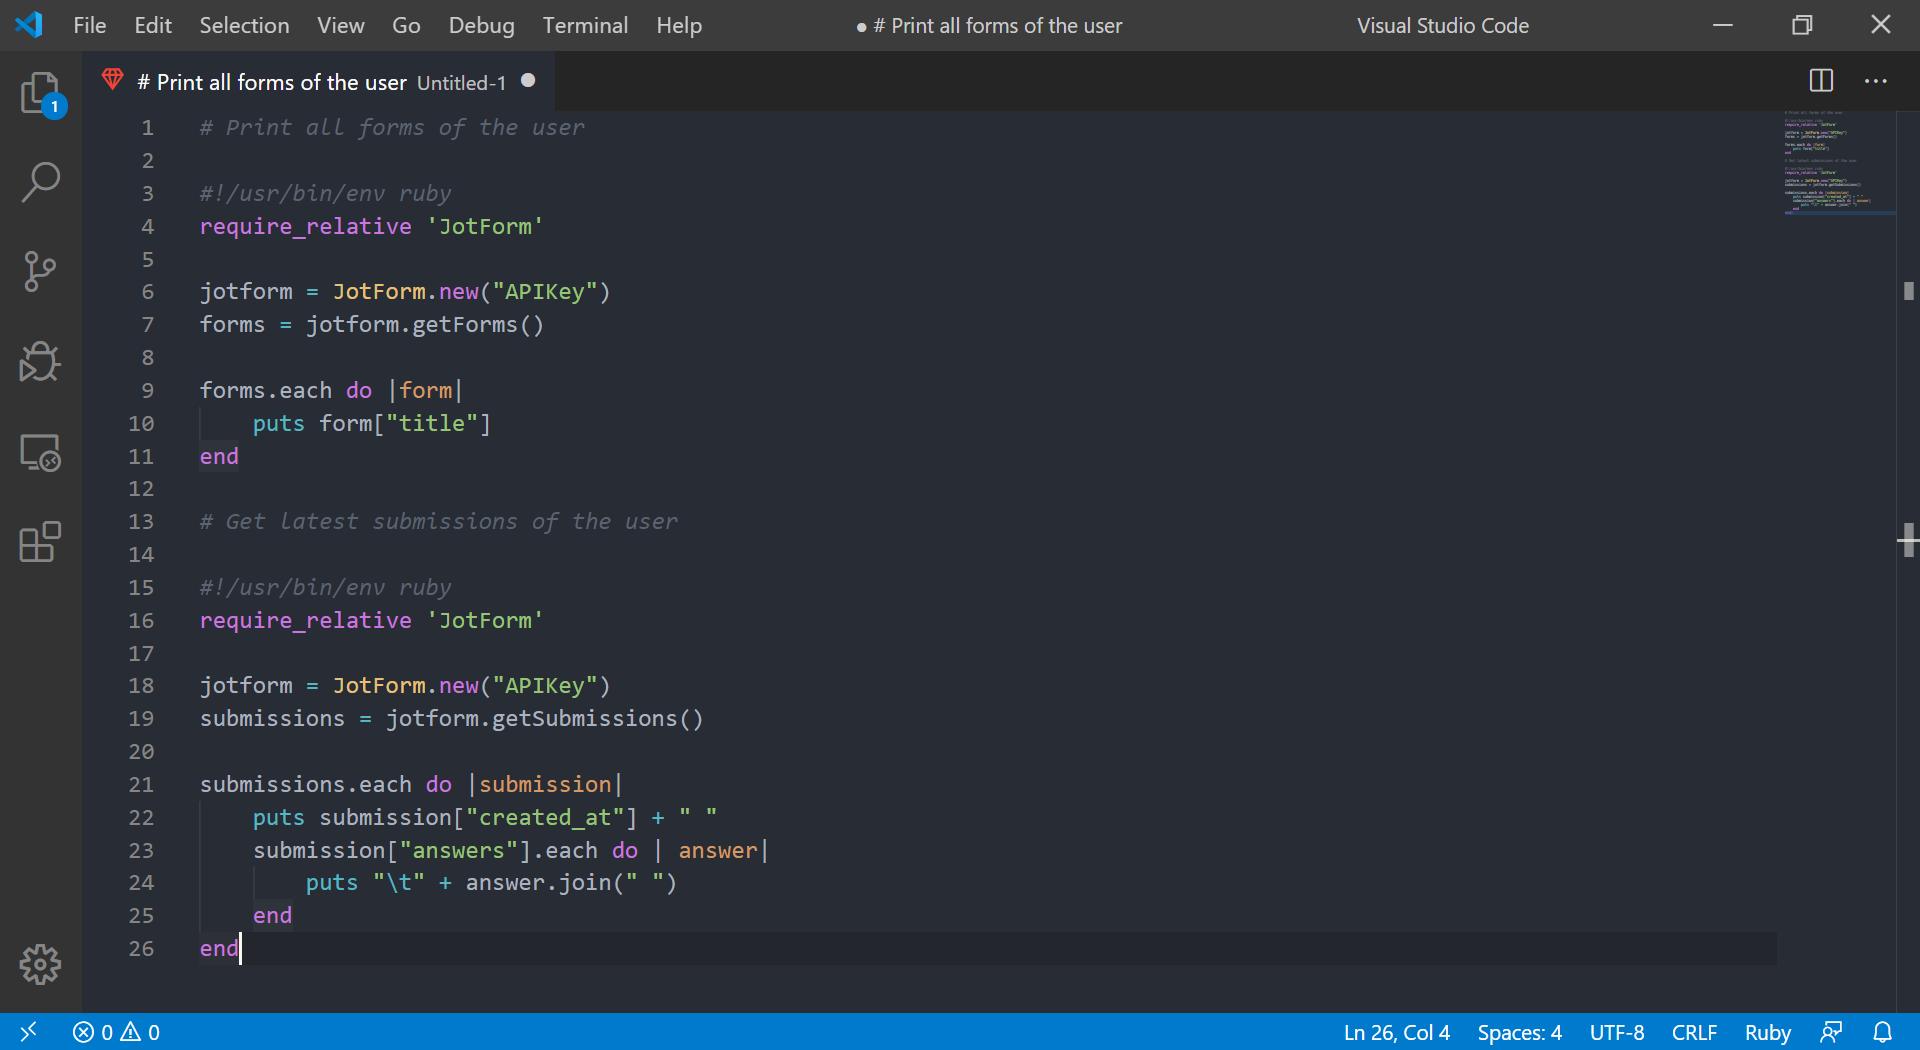 Ruby Wrapper_0